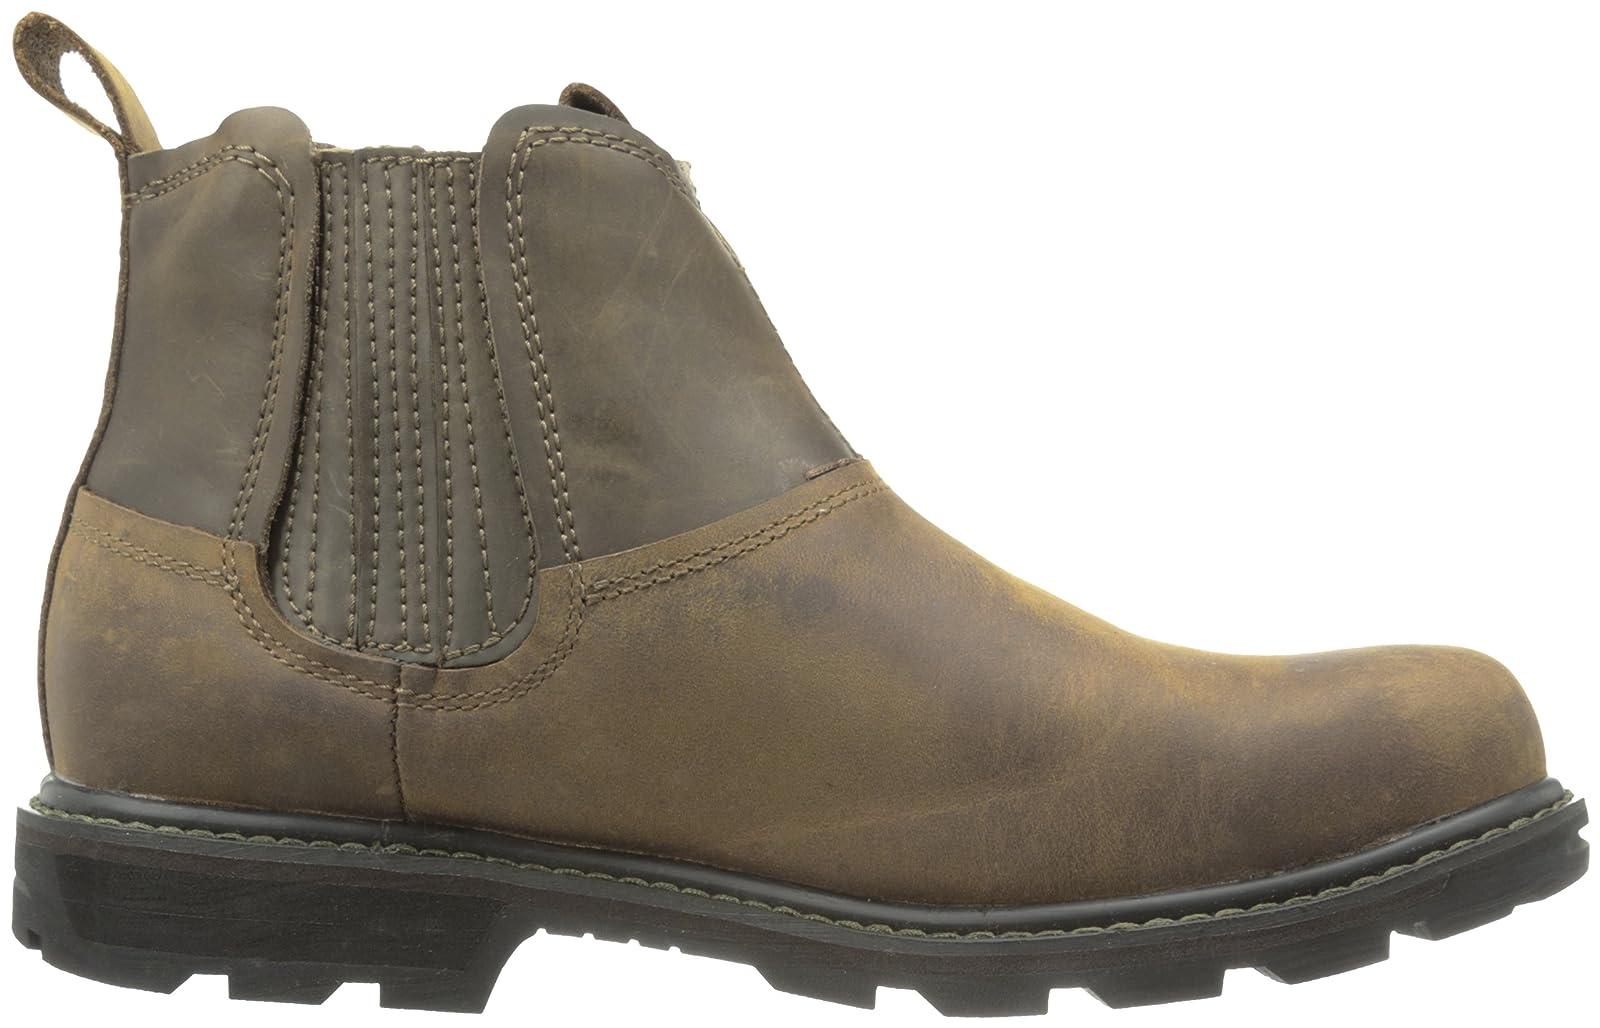 Skechers USA Men's Blaine Orsen Ankle Boot Dark Brown - 6